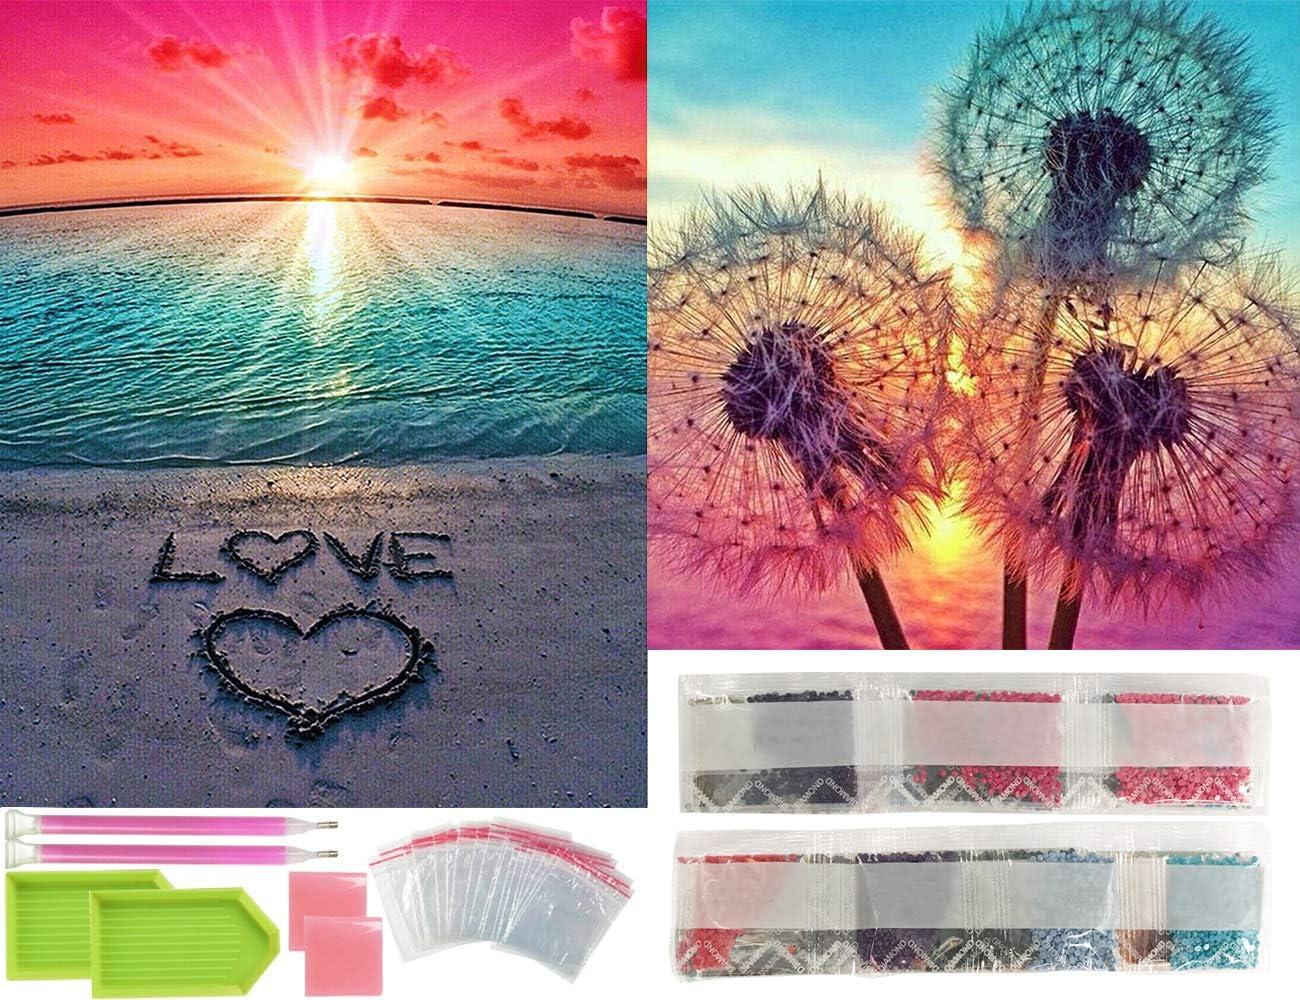 Diamond Painting Kits for Adults, TOPWOOZU 5D DIY Art Full Drill 2 Pack